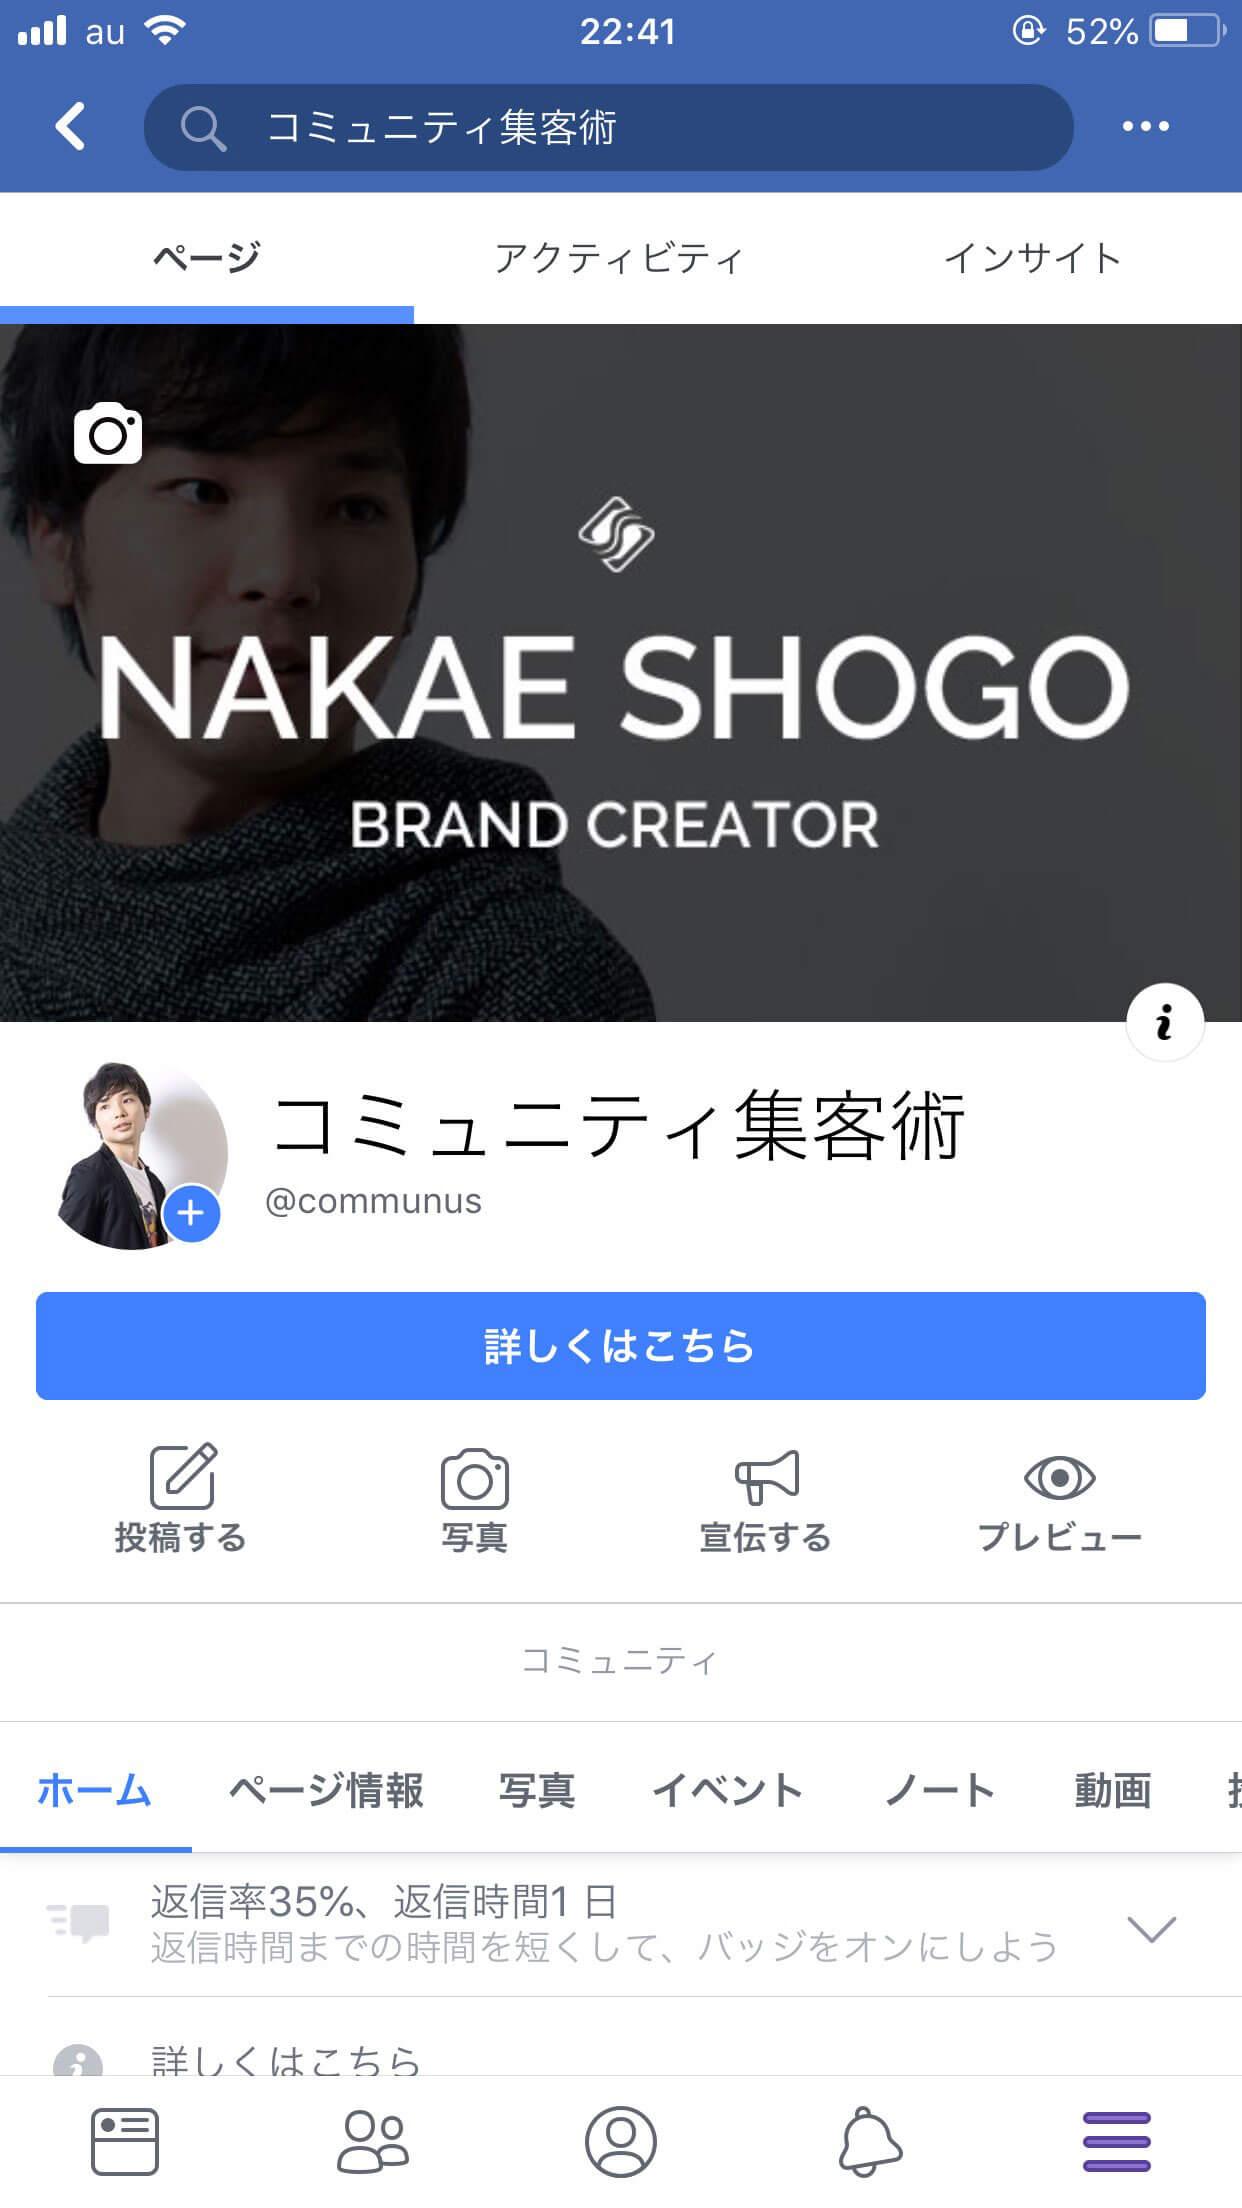 facebookページホーム画面